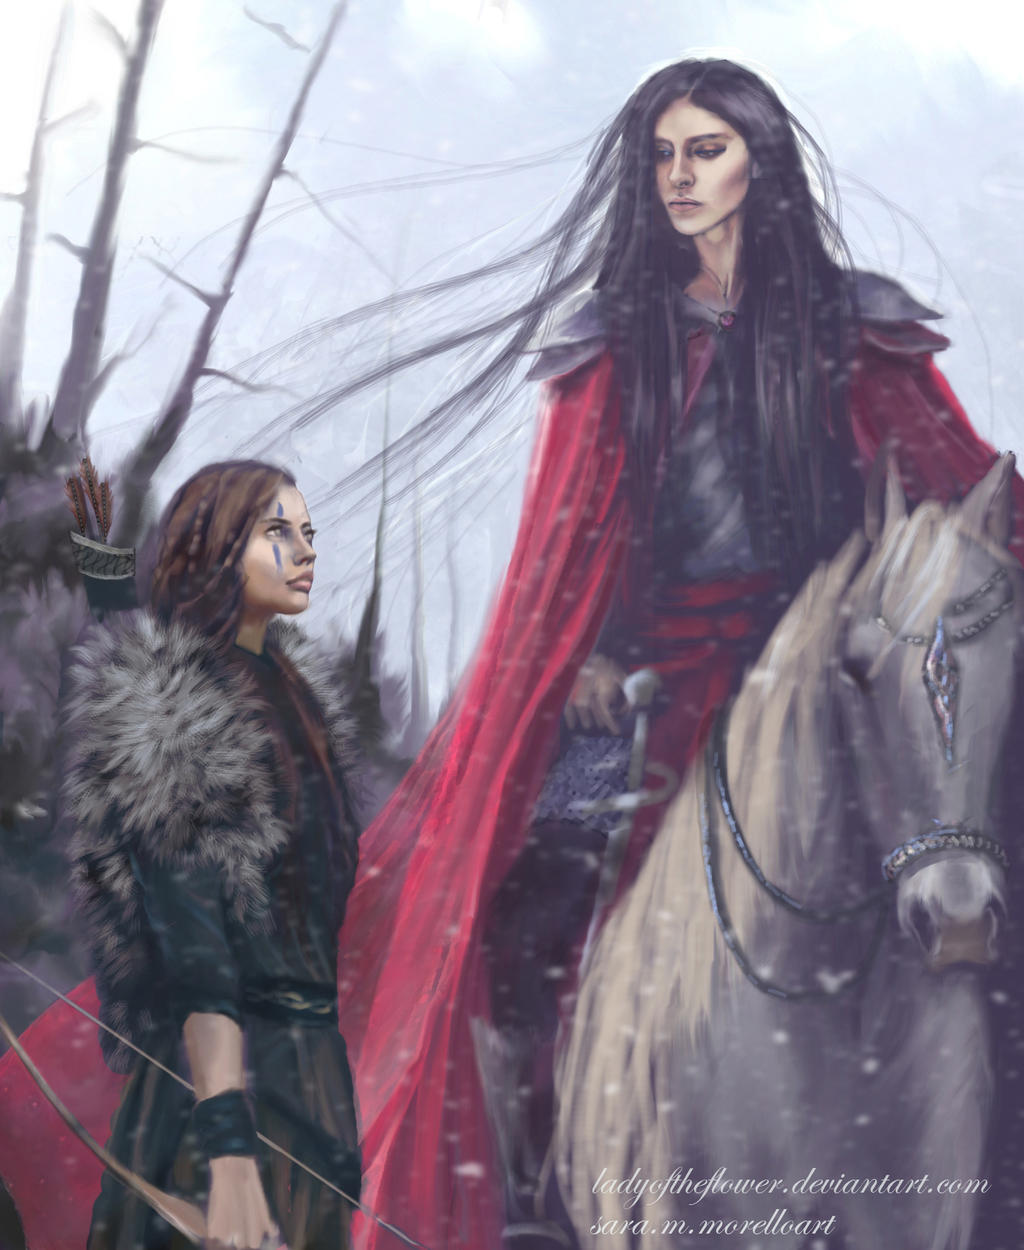 Caranthir and Haleth